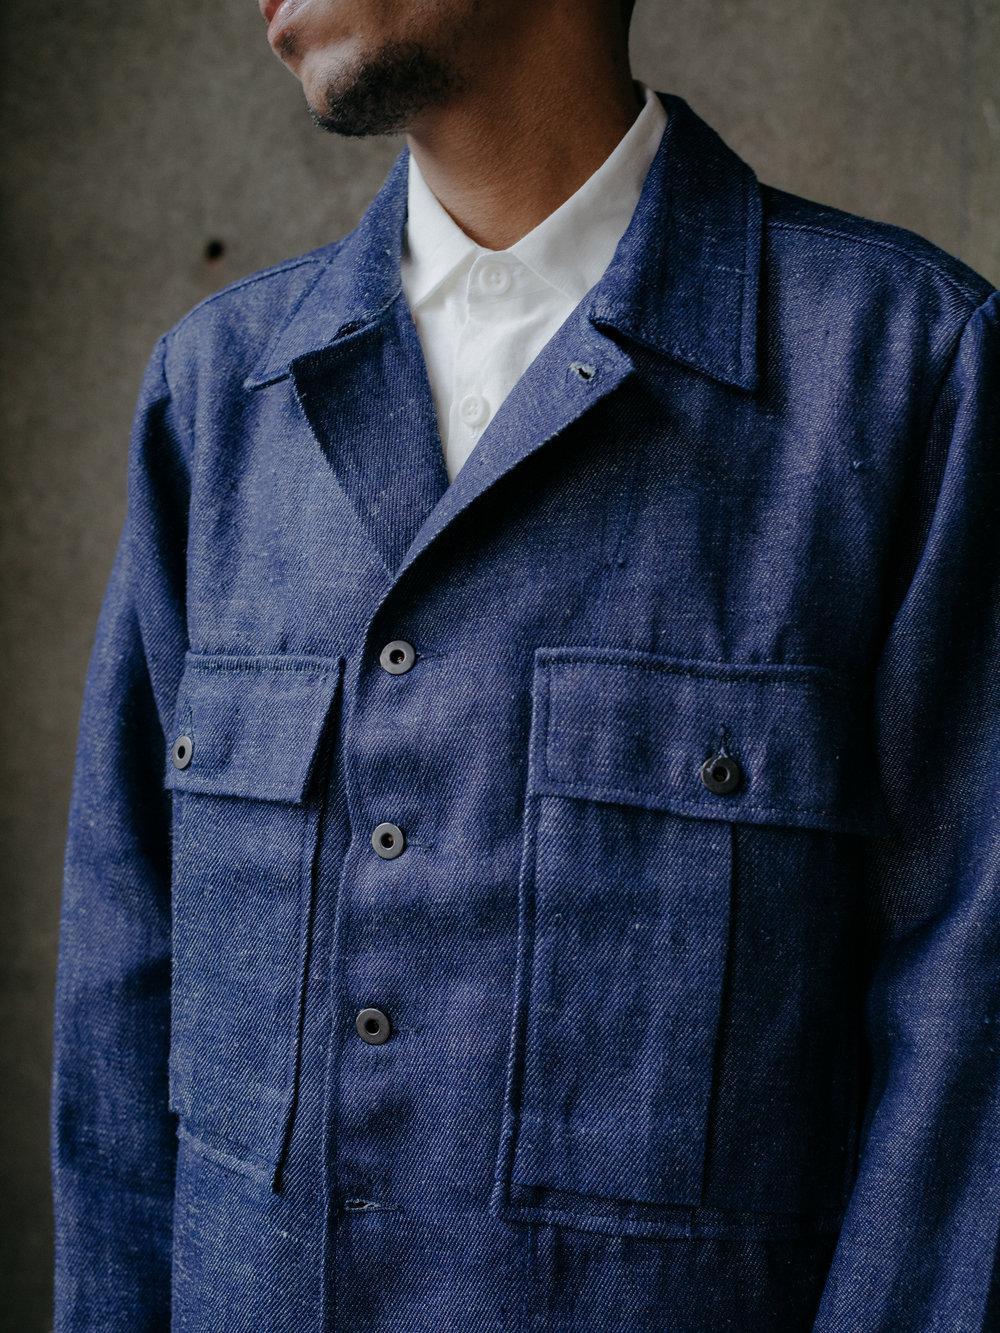 evan-kinori-bellow-pocket-jacket-hemp-denim-5